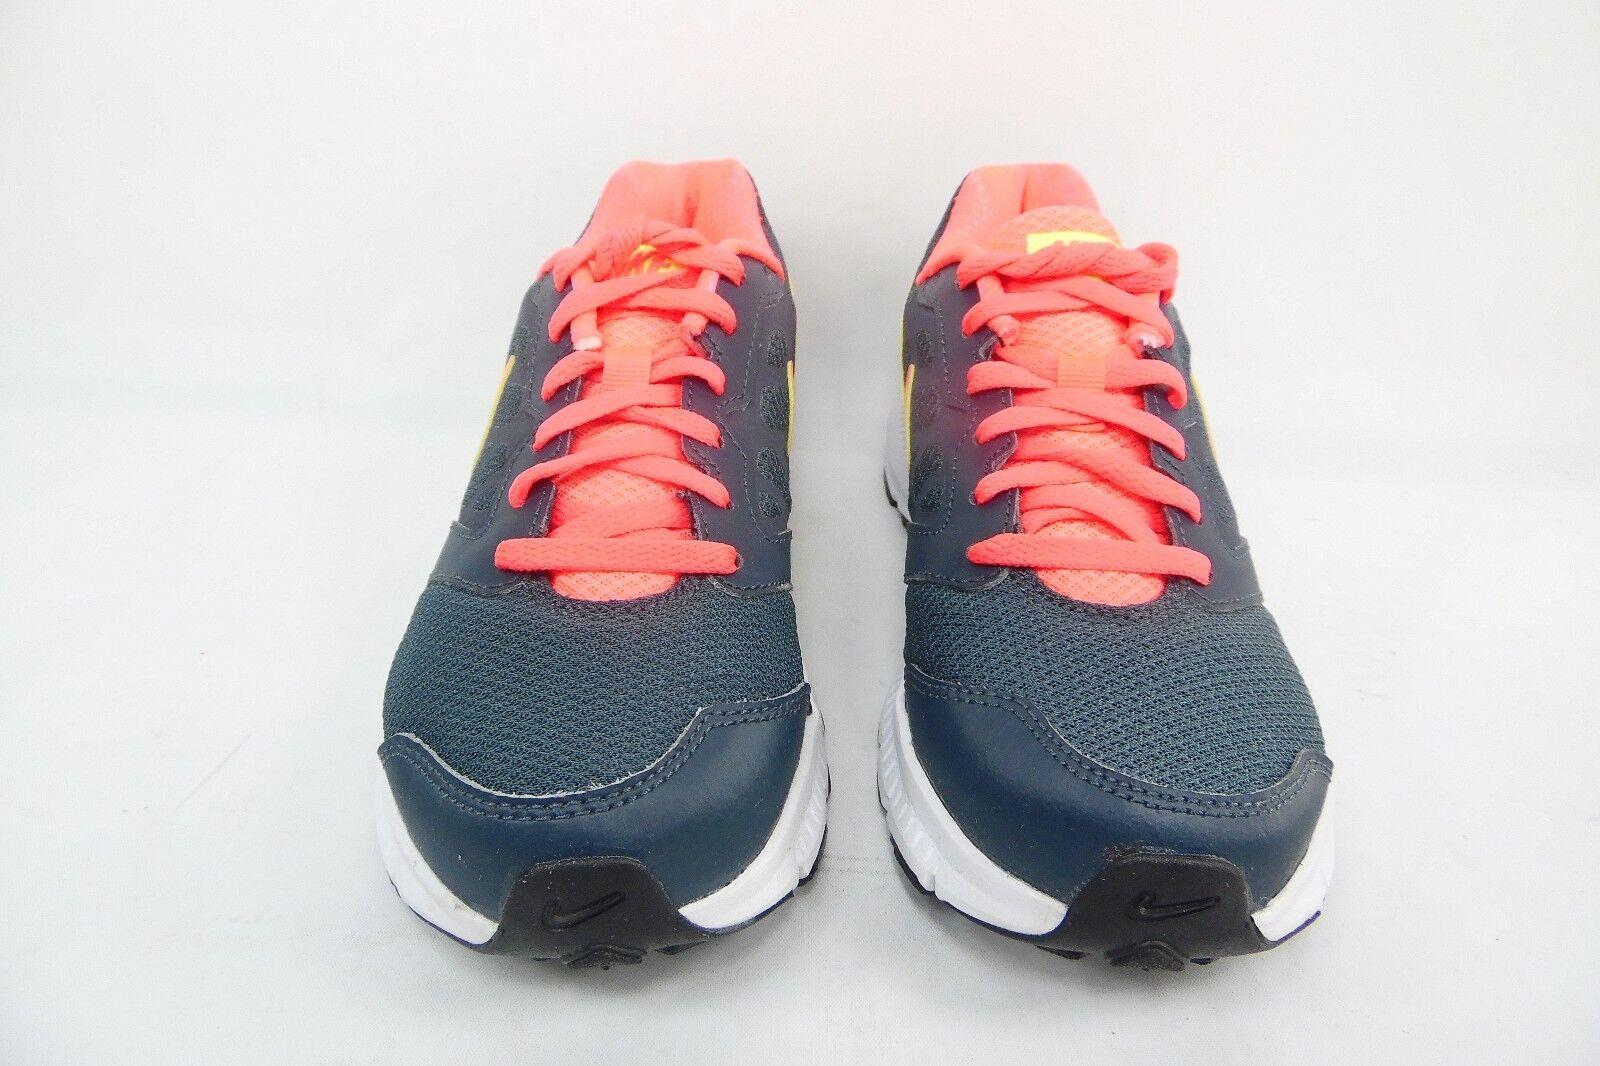 Nike Women's Downshifter 6 Running Shoe Multi-color Size 6 NWOB